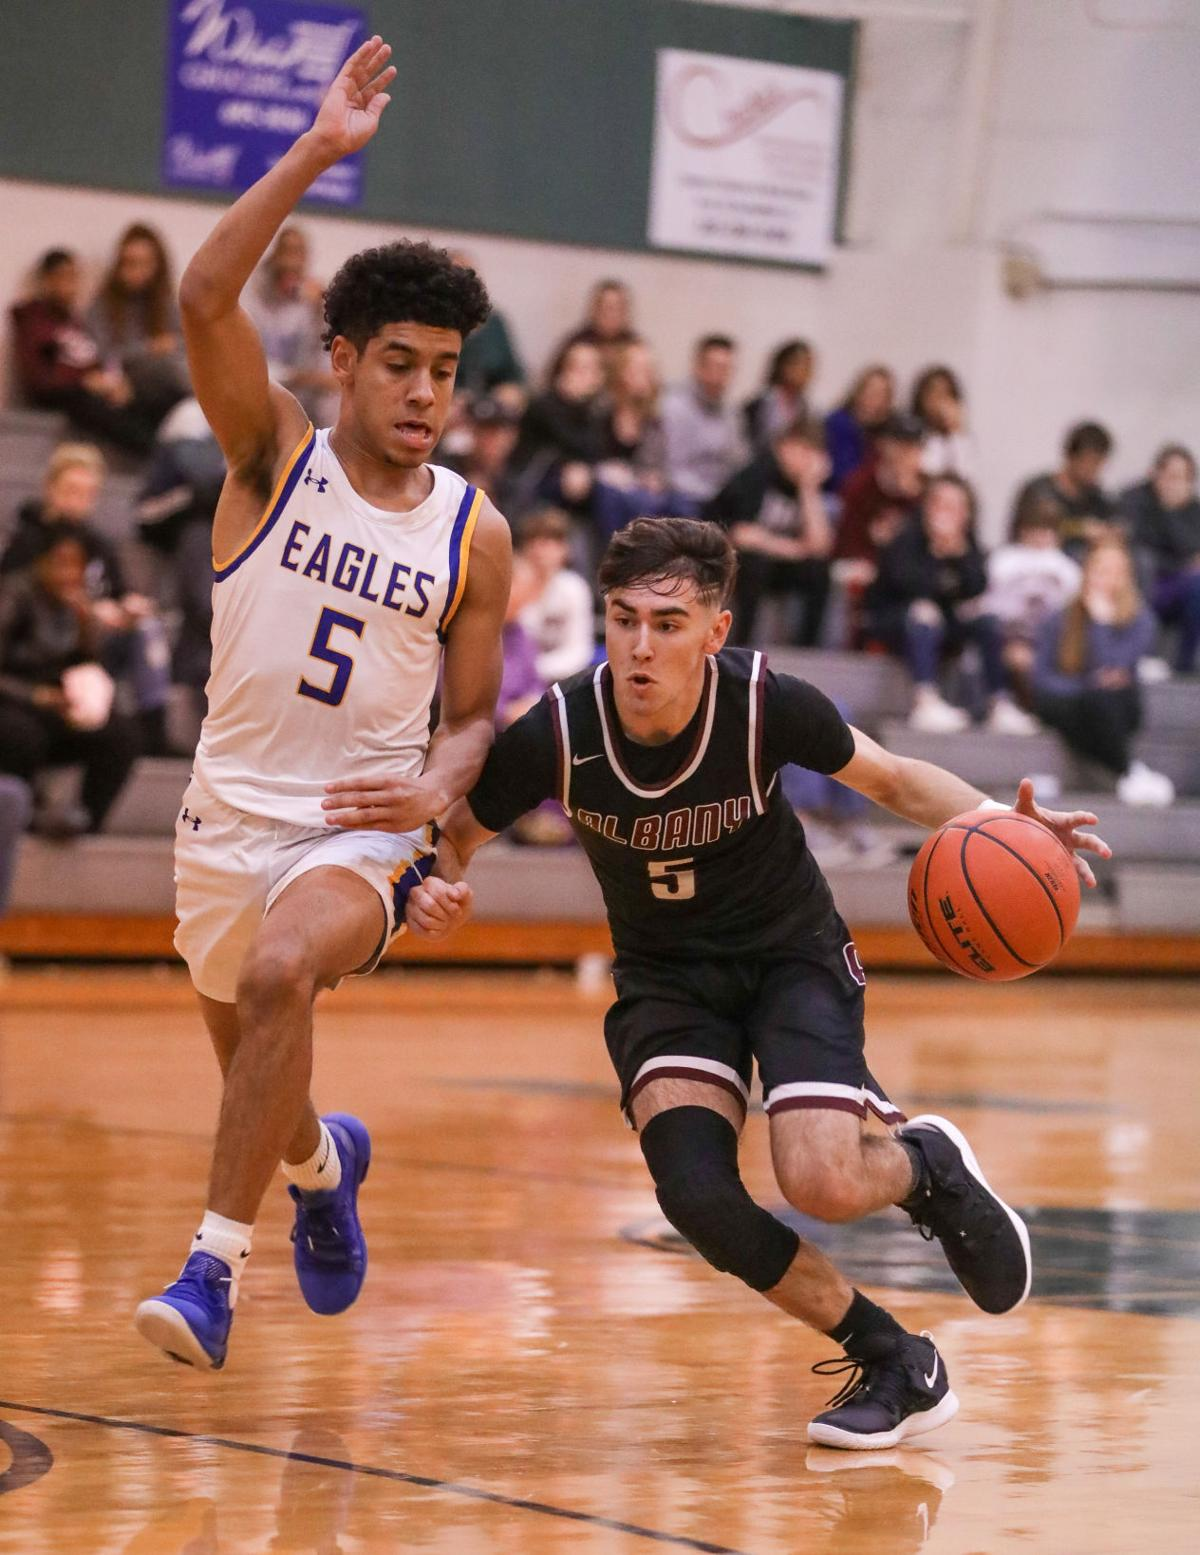 Albany vs Live Oak boys basketball Trey Yelverton DaDa Capling